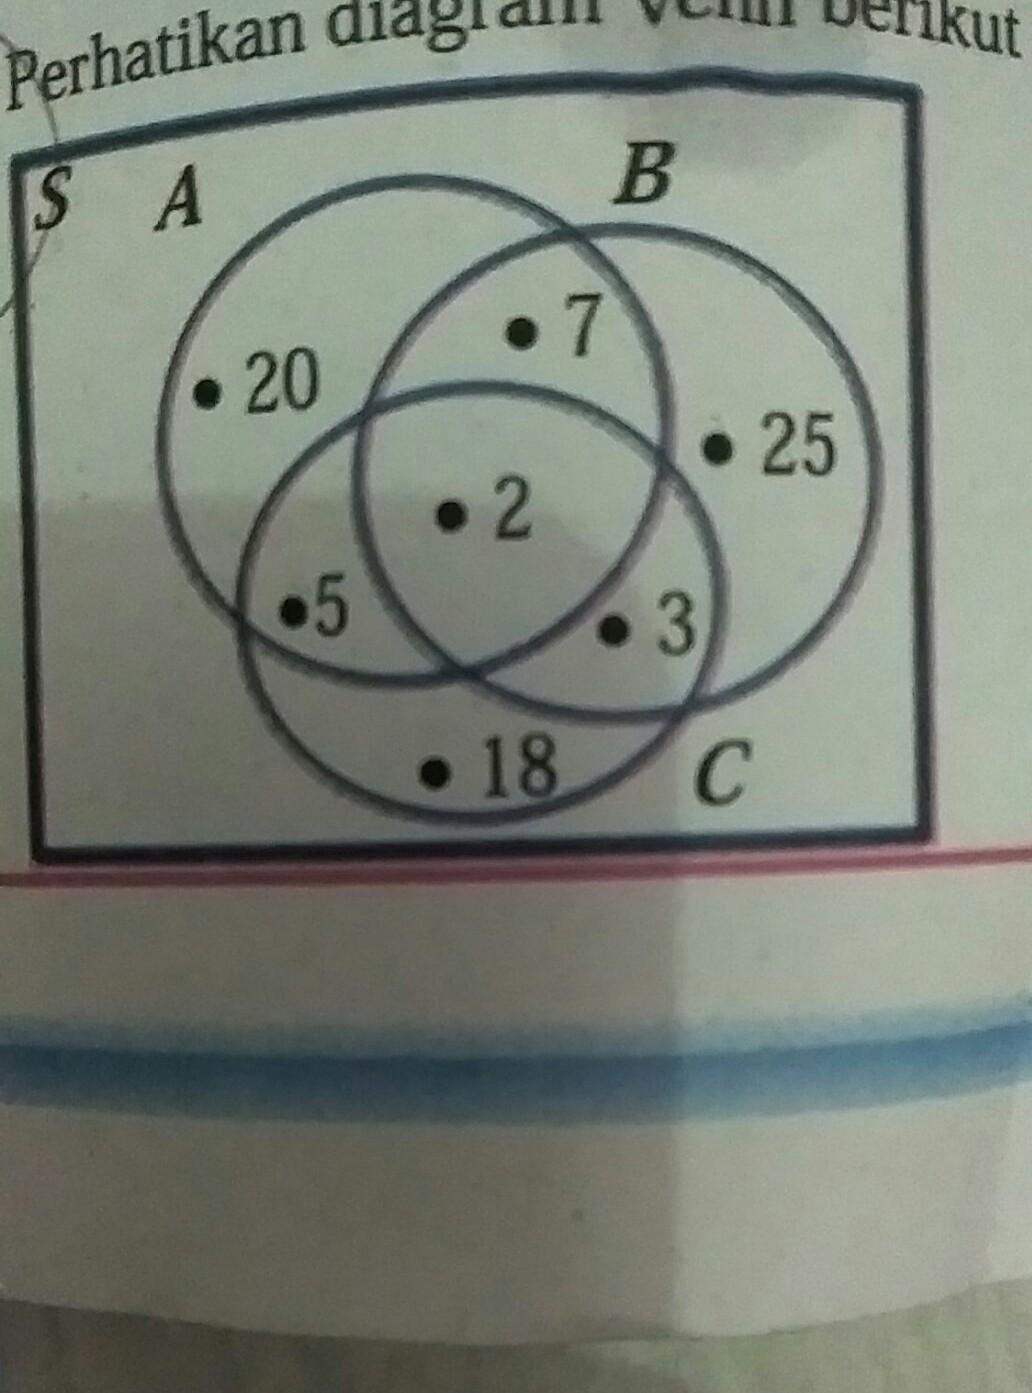 Perhatikan diagram venn berikut berdasarkan diagram venn tersebut unduh jpg ccuart Images